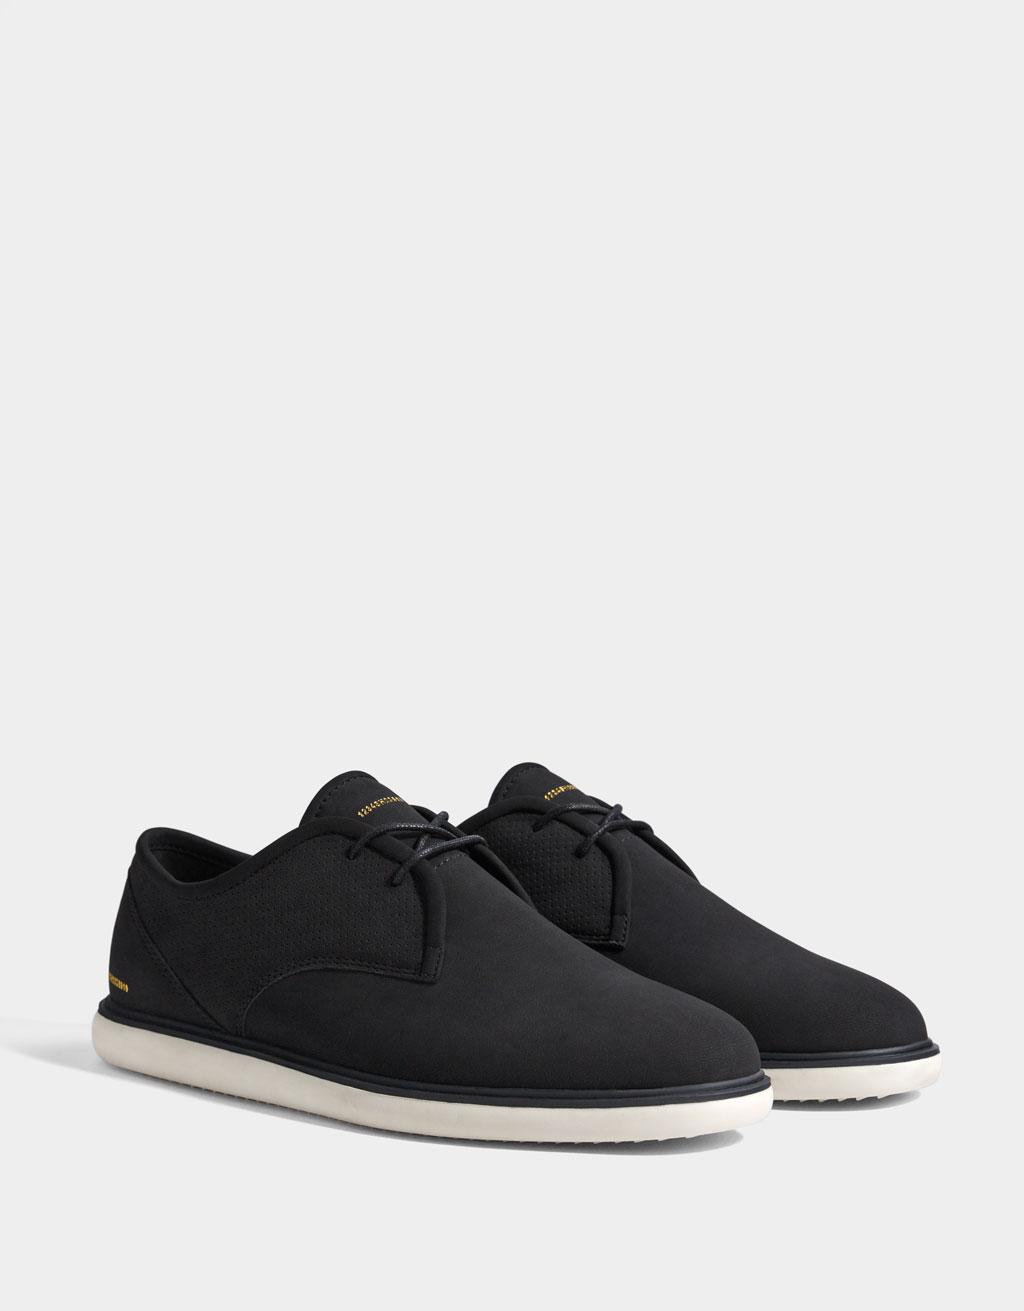 Zapatos Zapatos Friday Hombre Black Black De Friday 4qALj35R